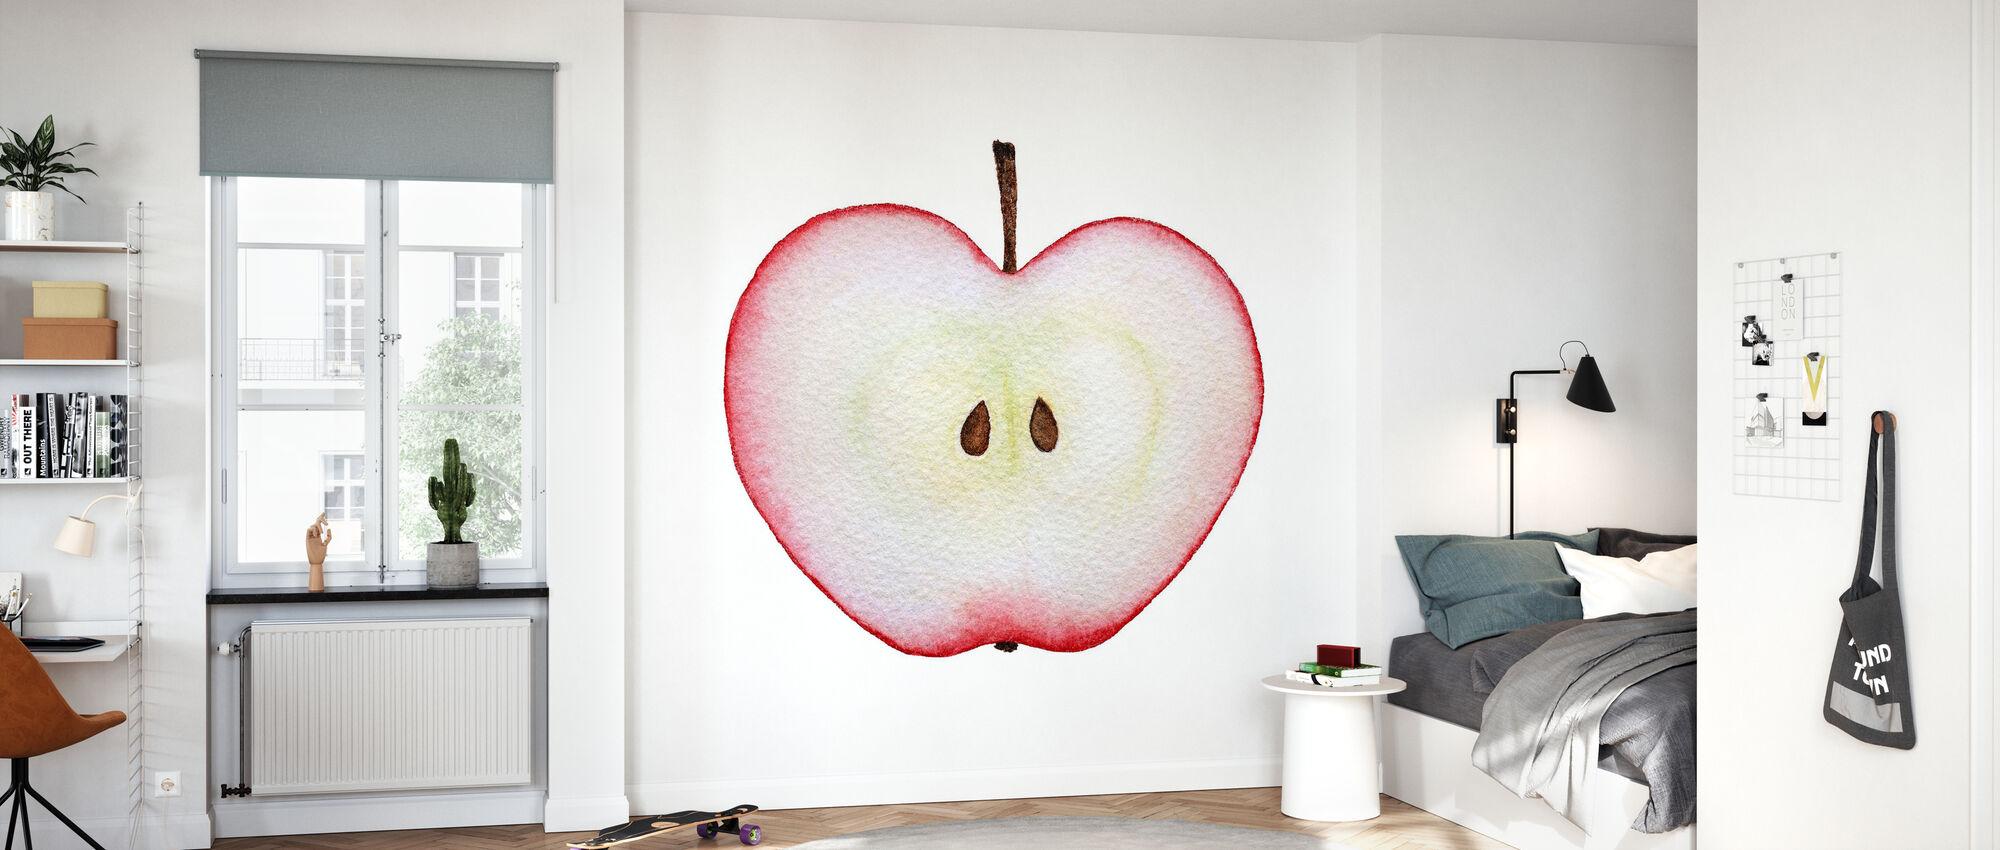 Halbierter roter Apfel - Tapete - Kinderzimmer